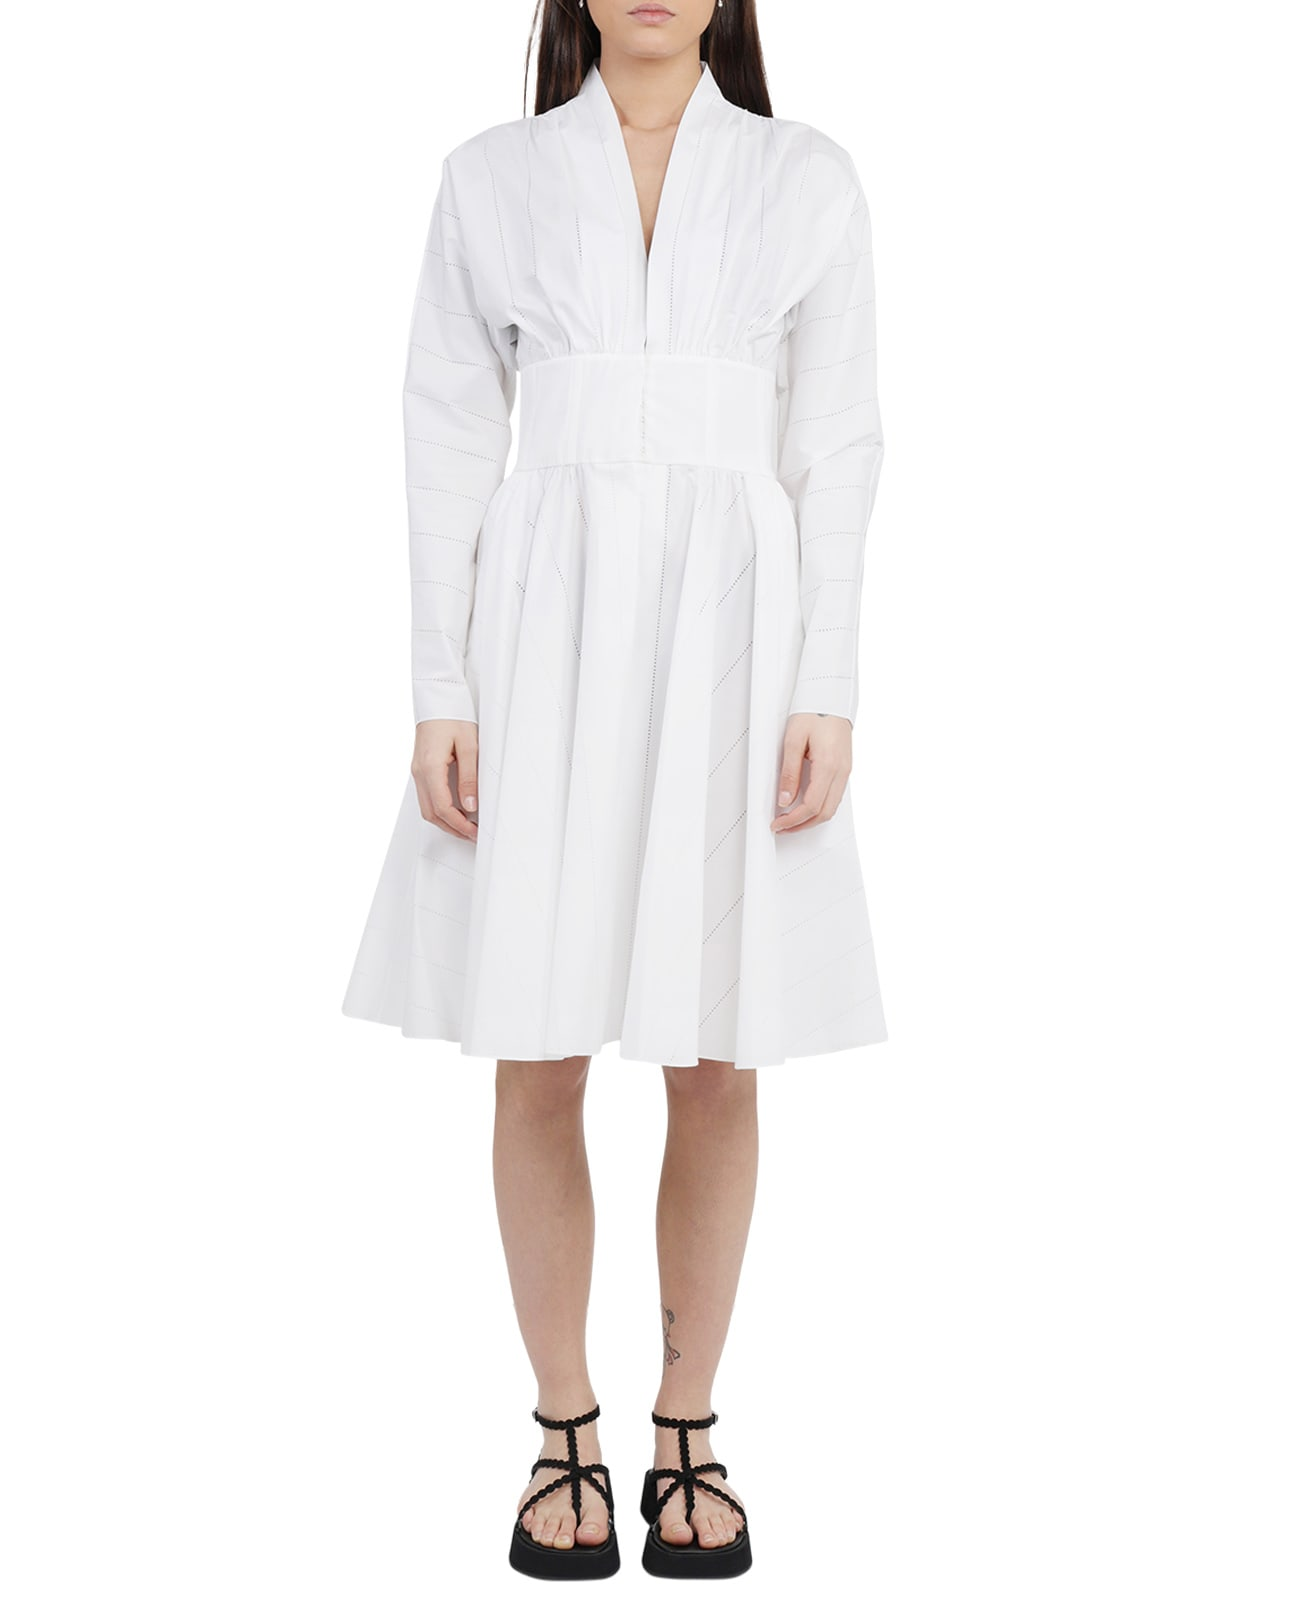 Alaia White Bustier Dress